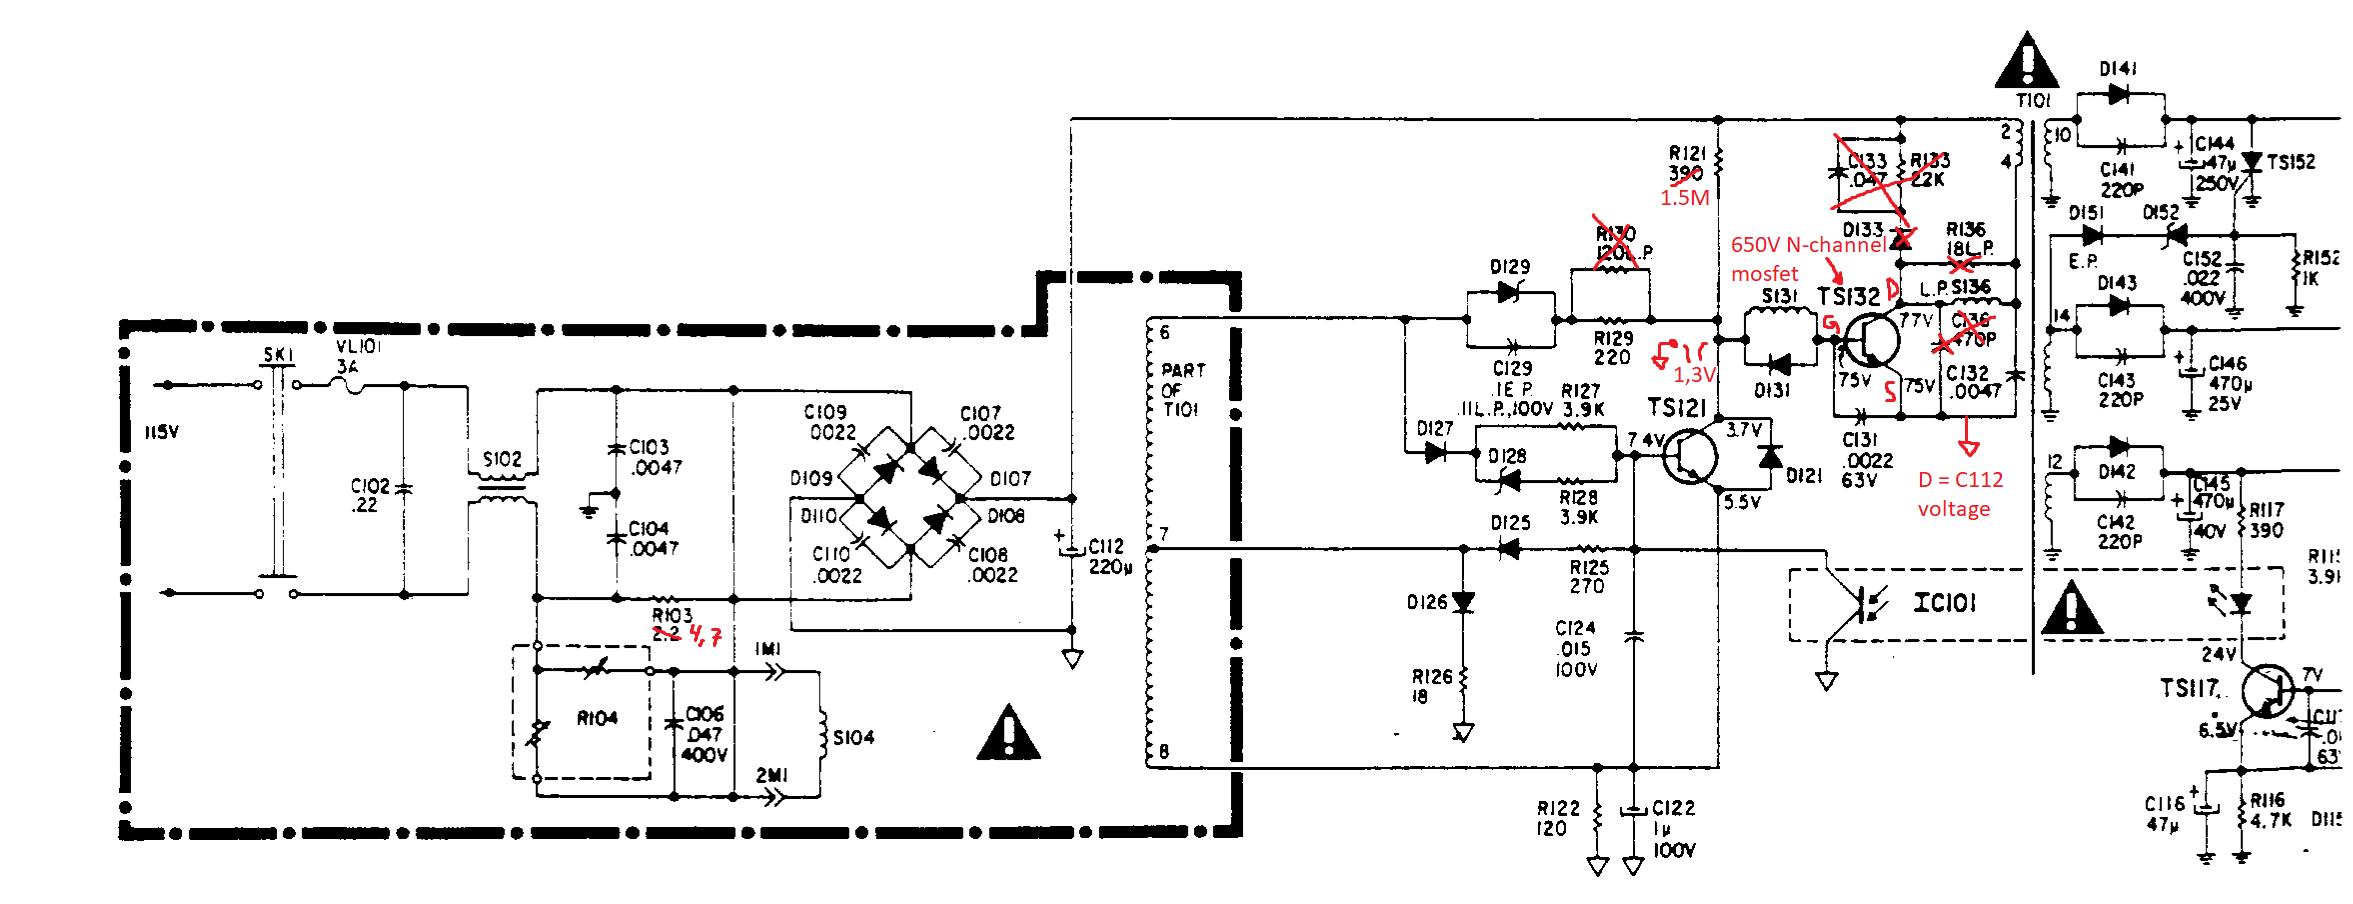 schematic-1 (2).png